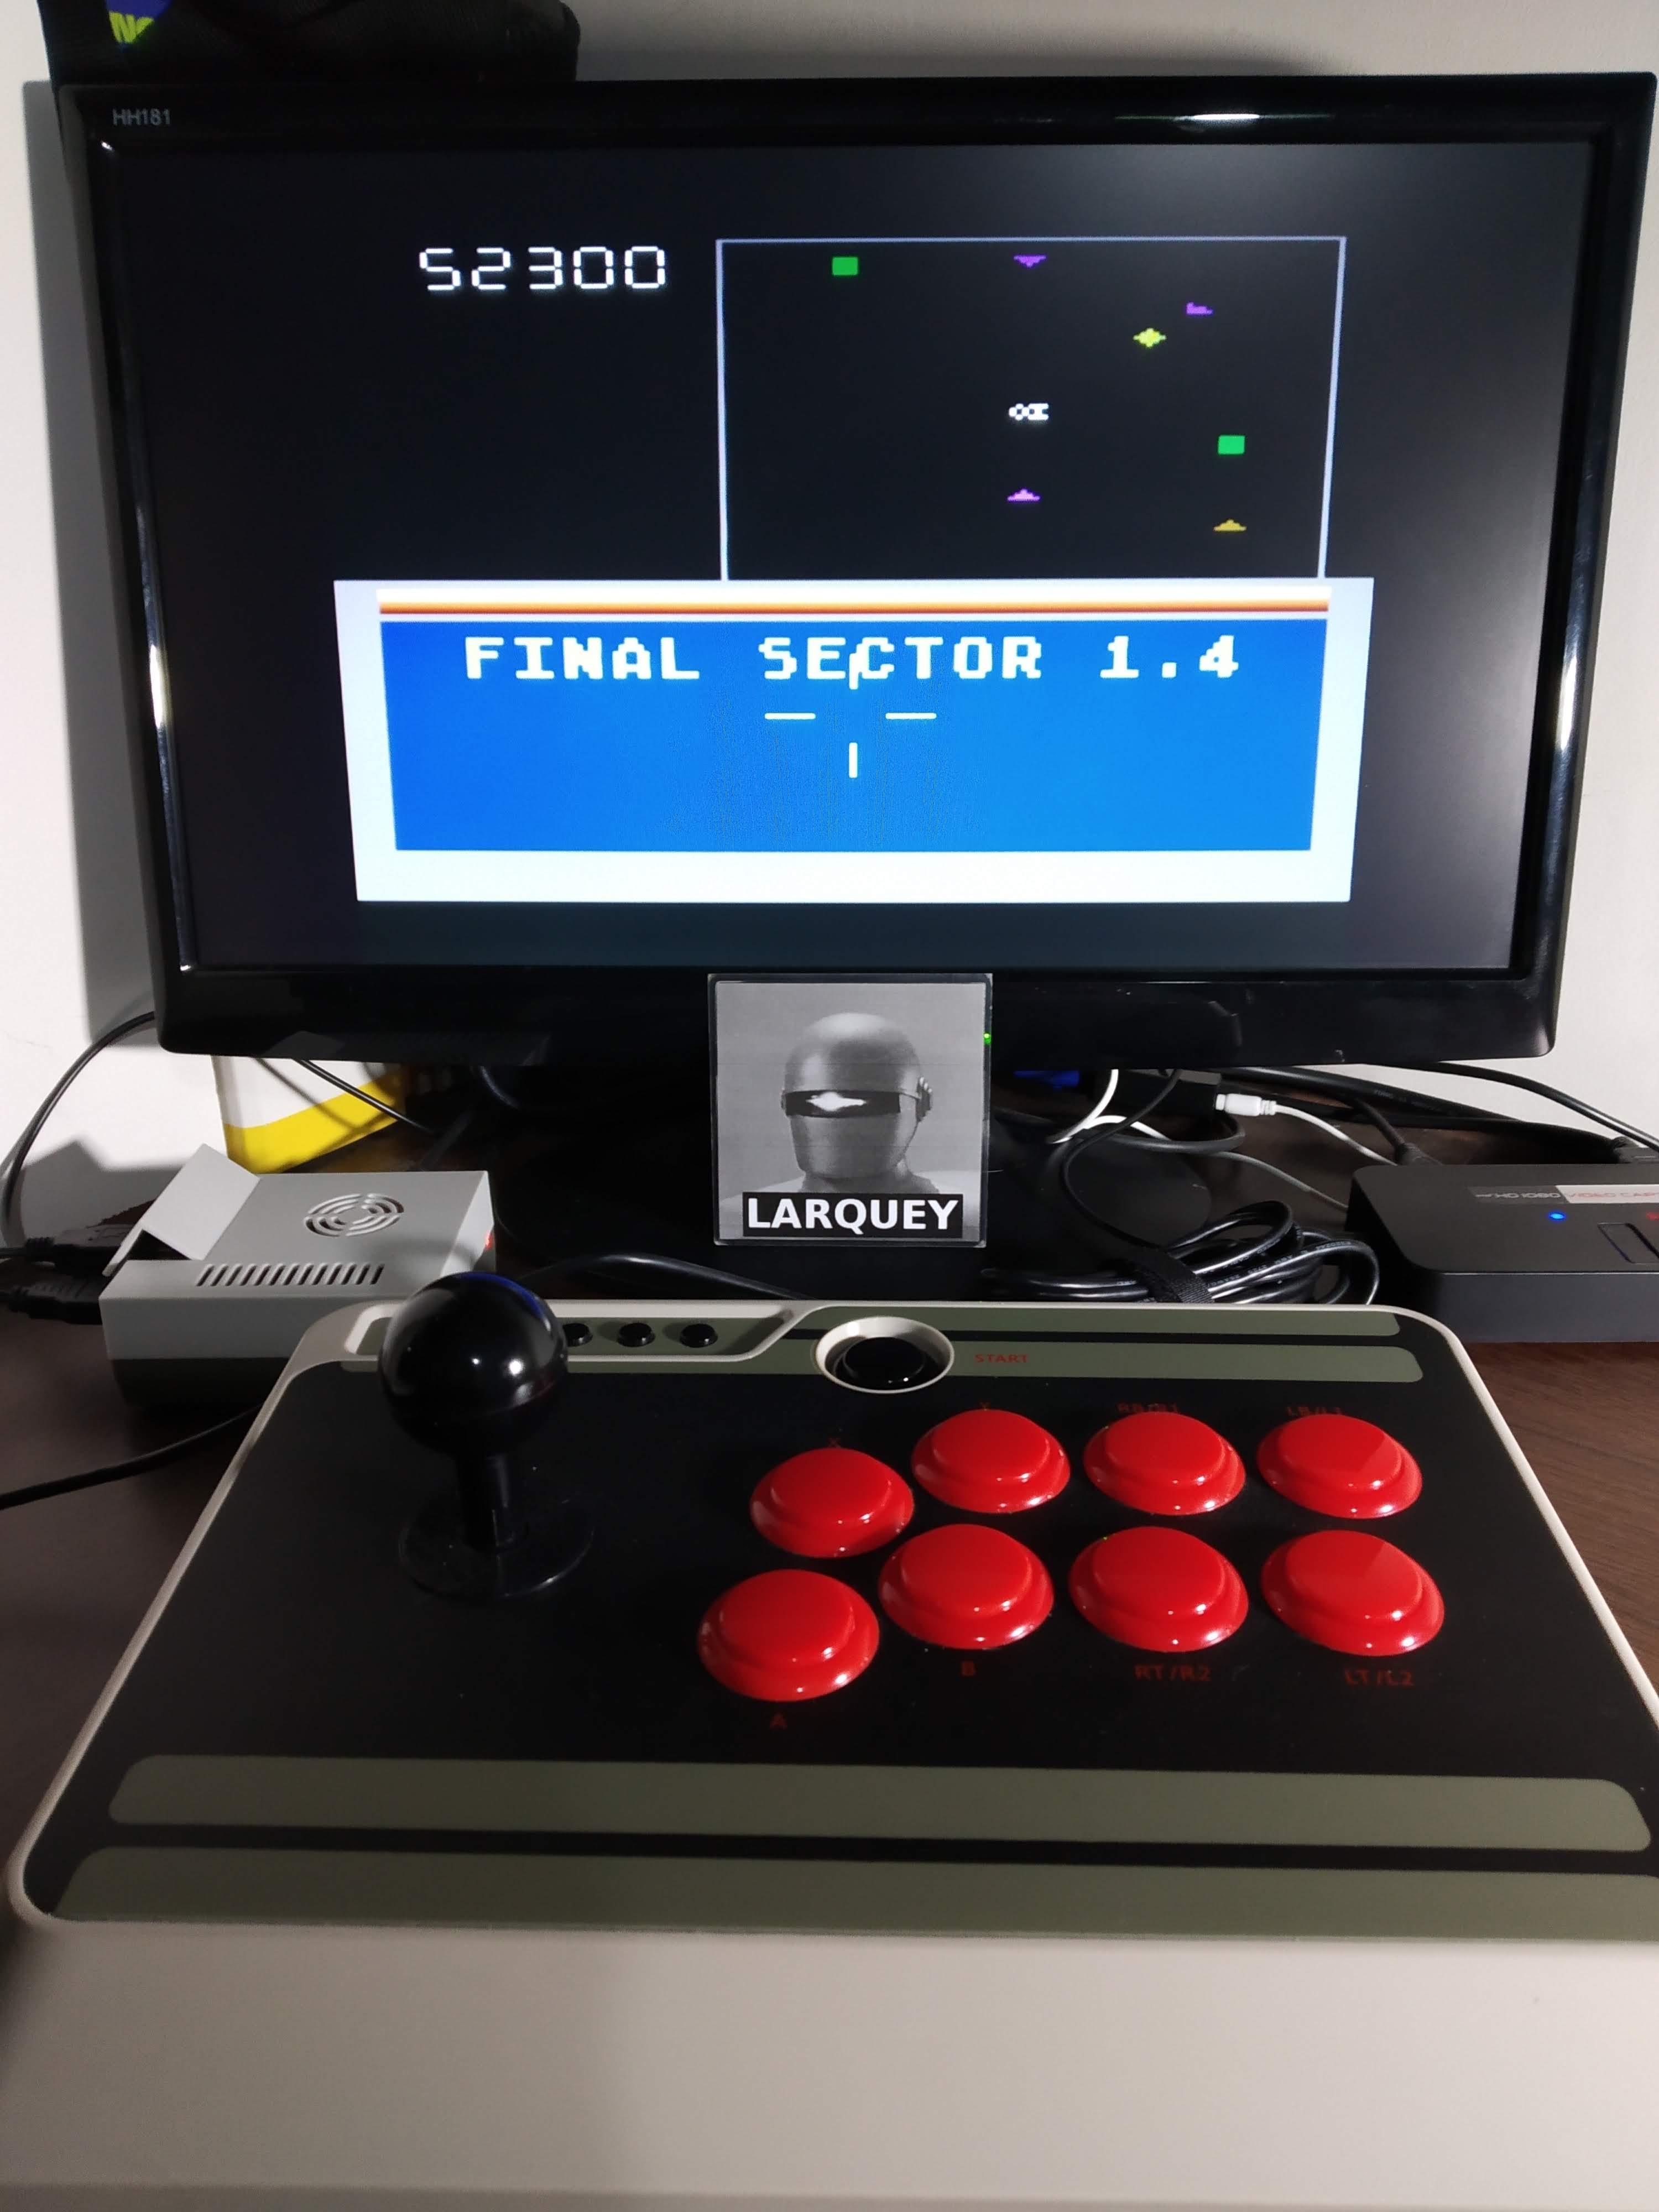 Larquey: Star Trek (Atari 5200 Emulated) 52,300 points on 2019-11-12 00:44:21